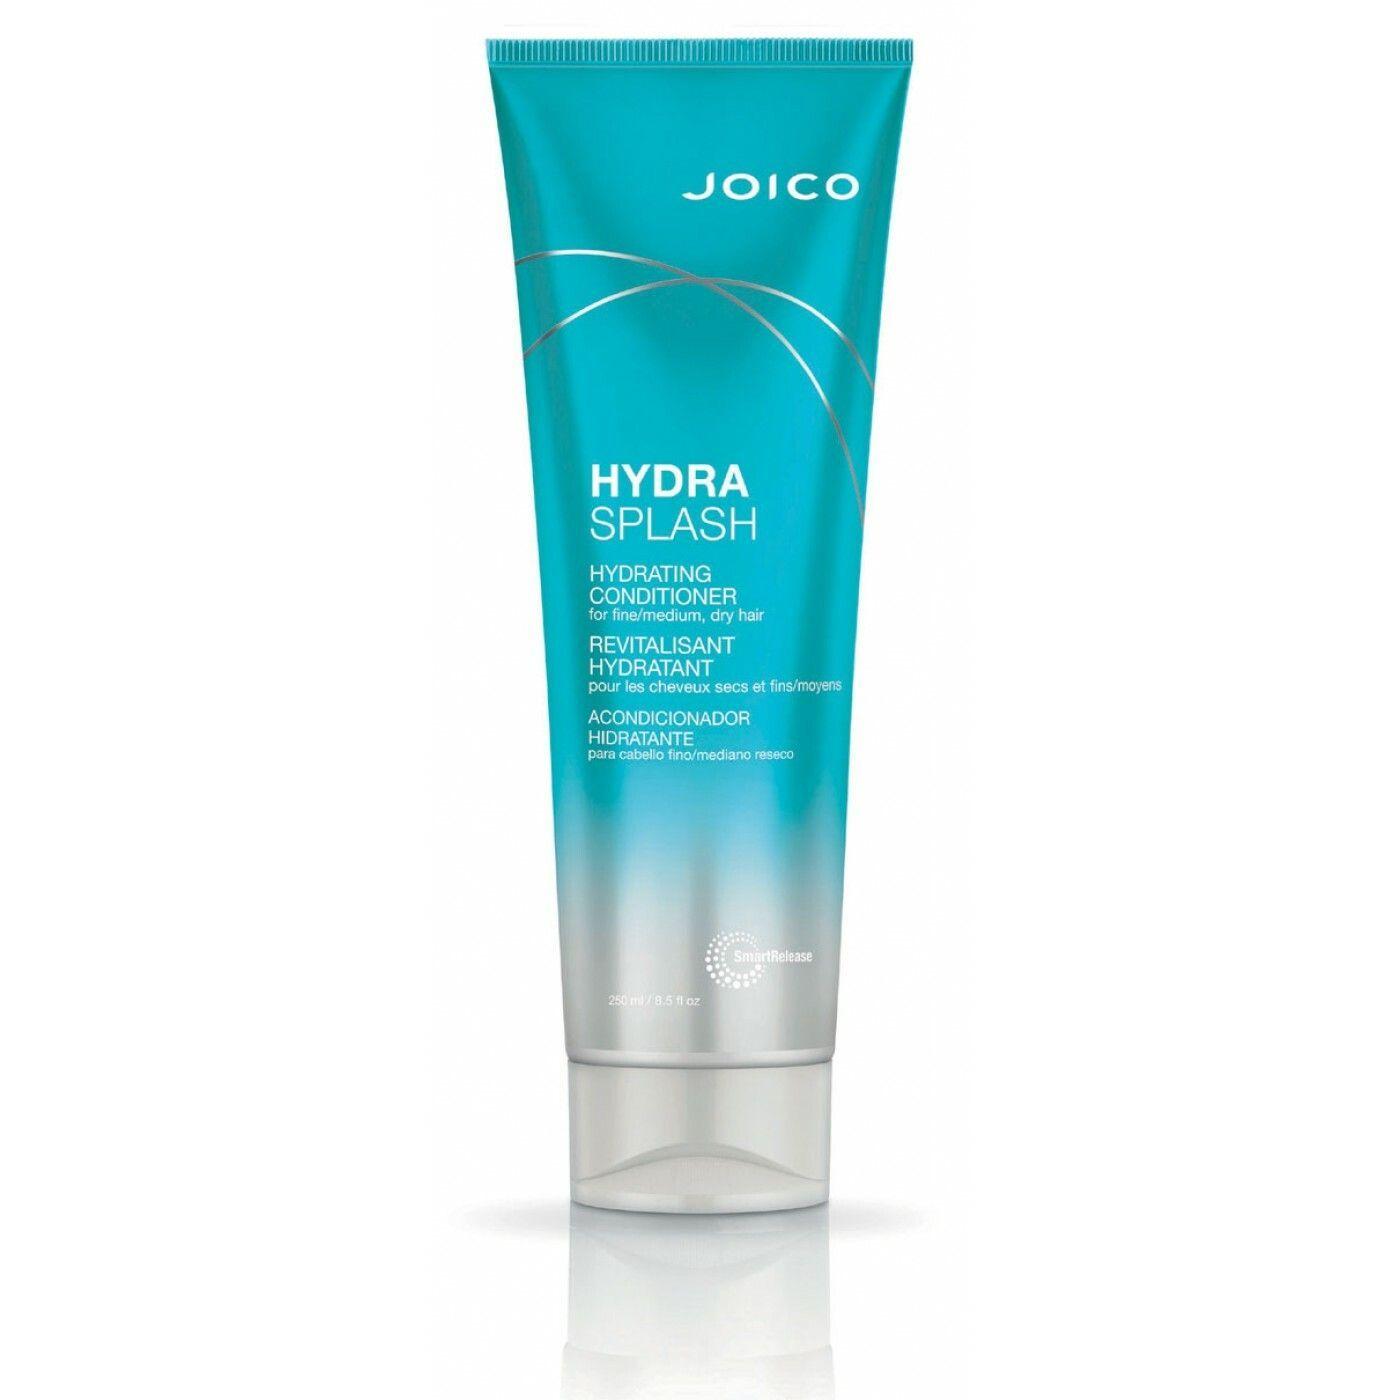 Joico Hydrasplash Hydrating Conditioner - 250ml